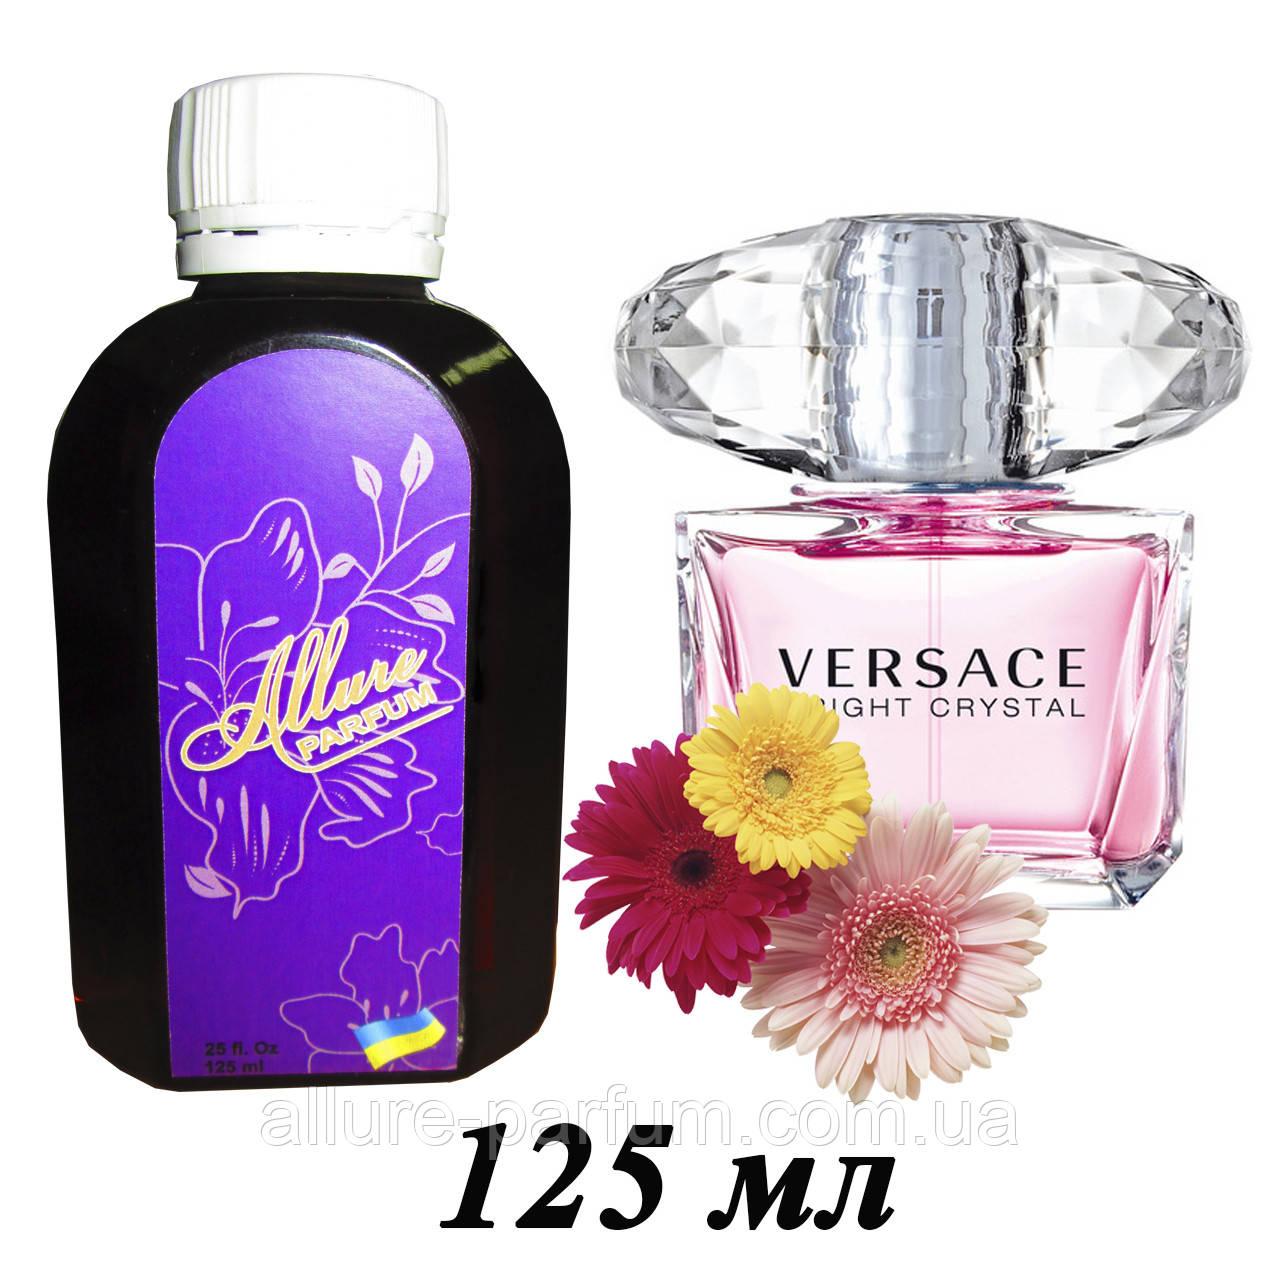 Женские духи 125 мл Versace/ Bright Crystal на разлив, фото 1